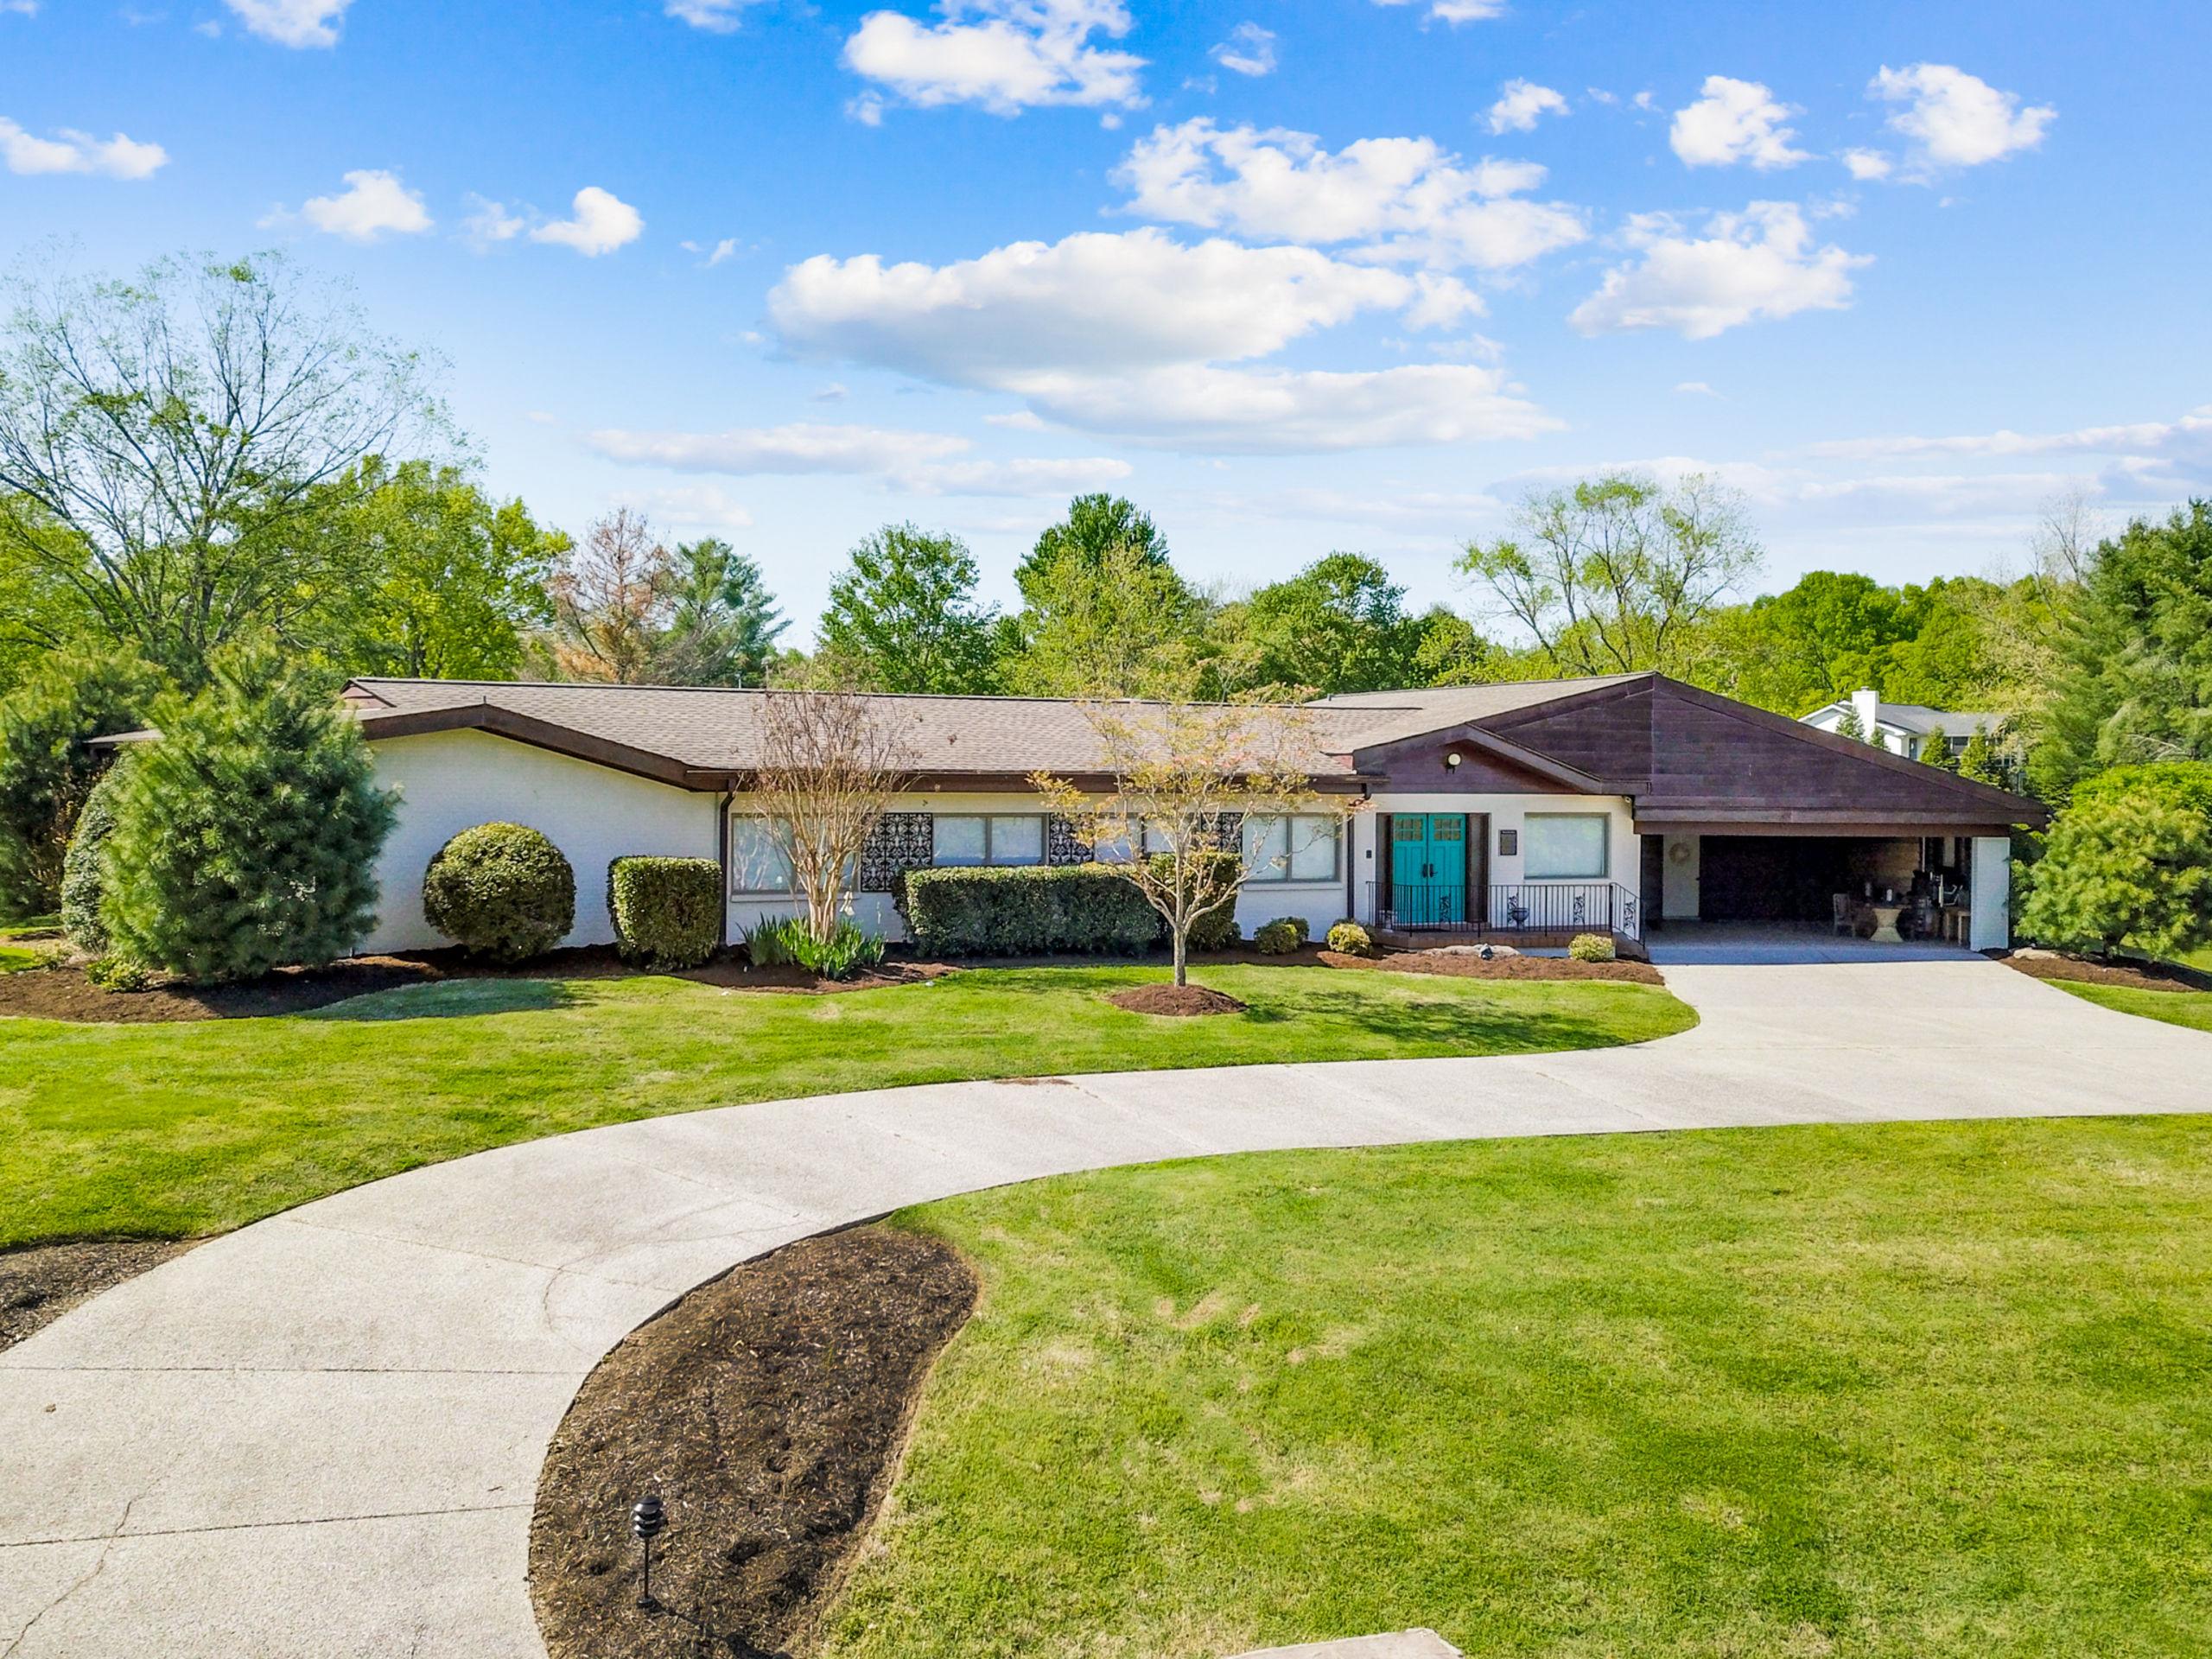 Mama Cash's house in Hendersonville, TN